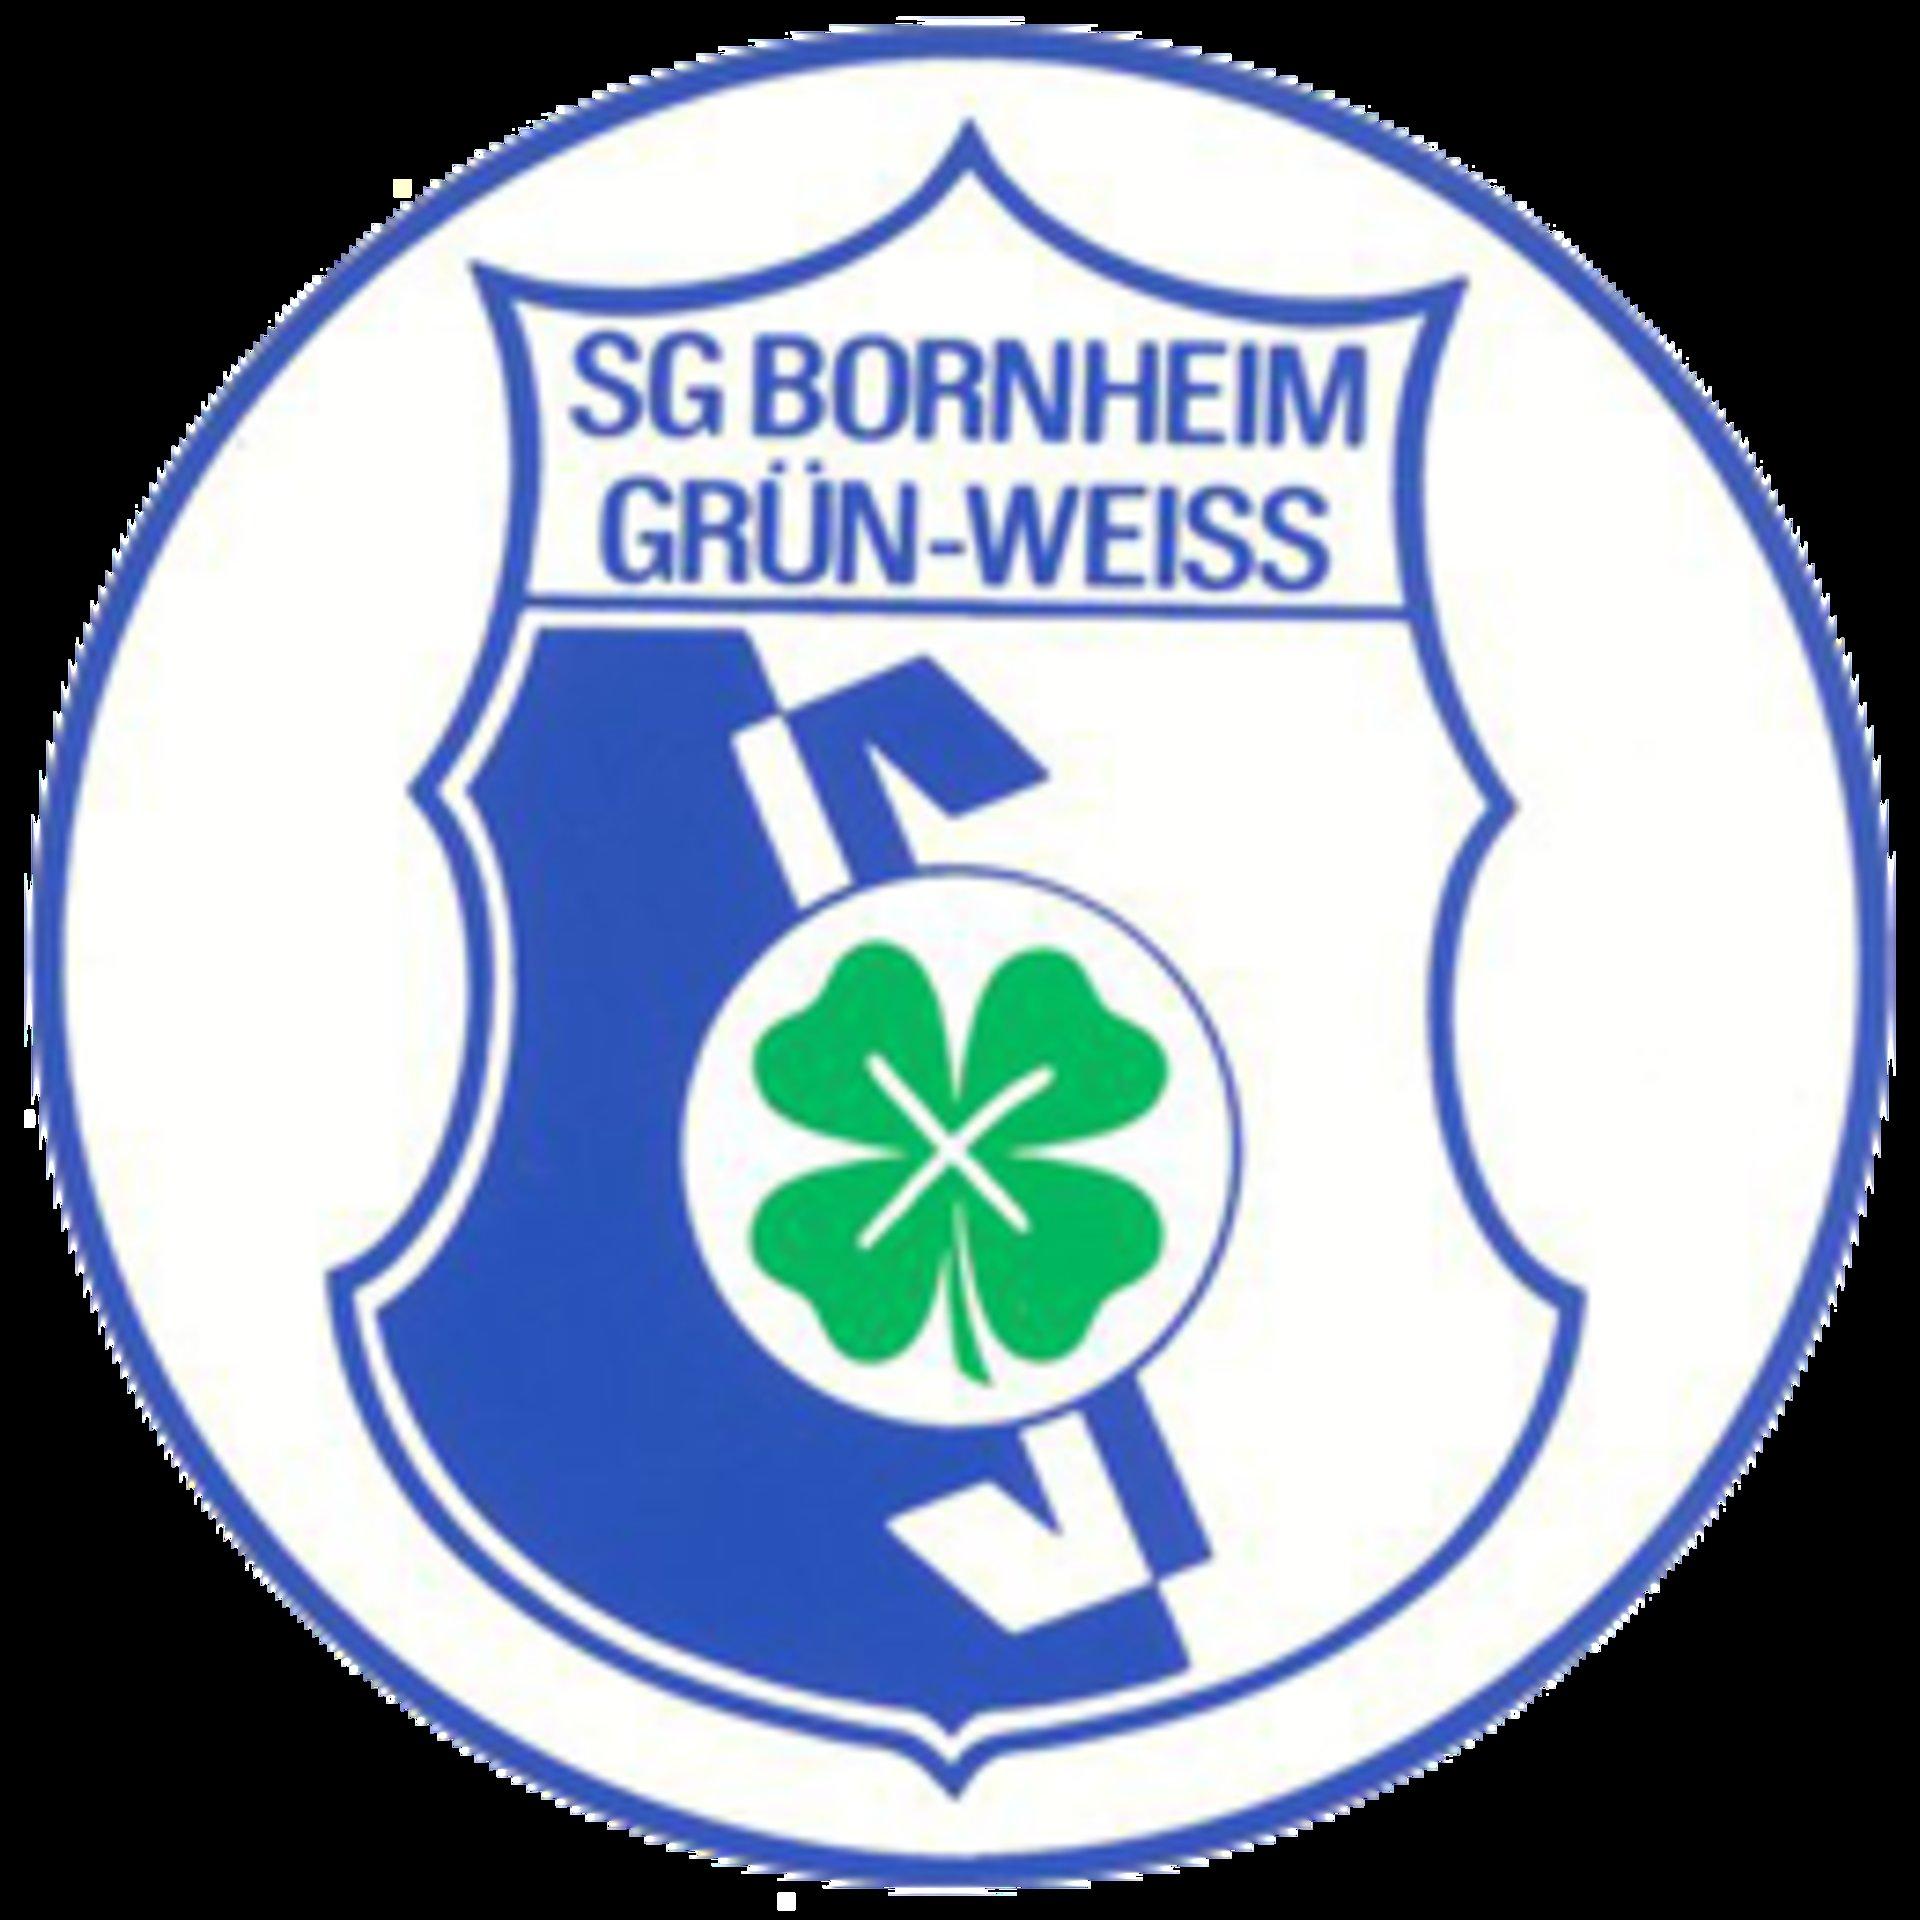 Sg Bornheim